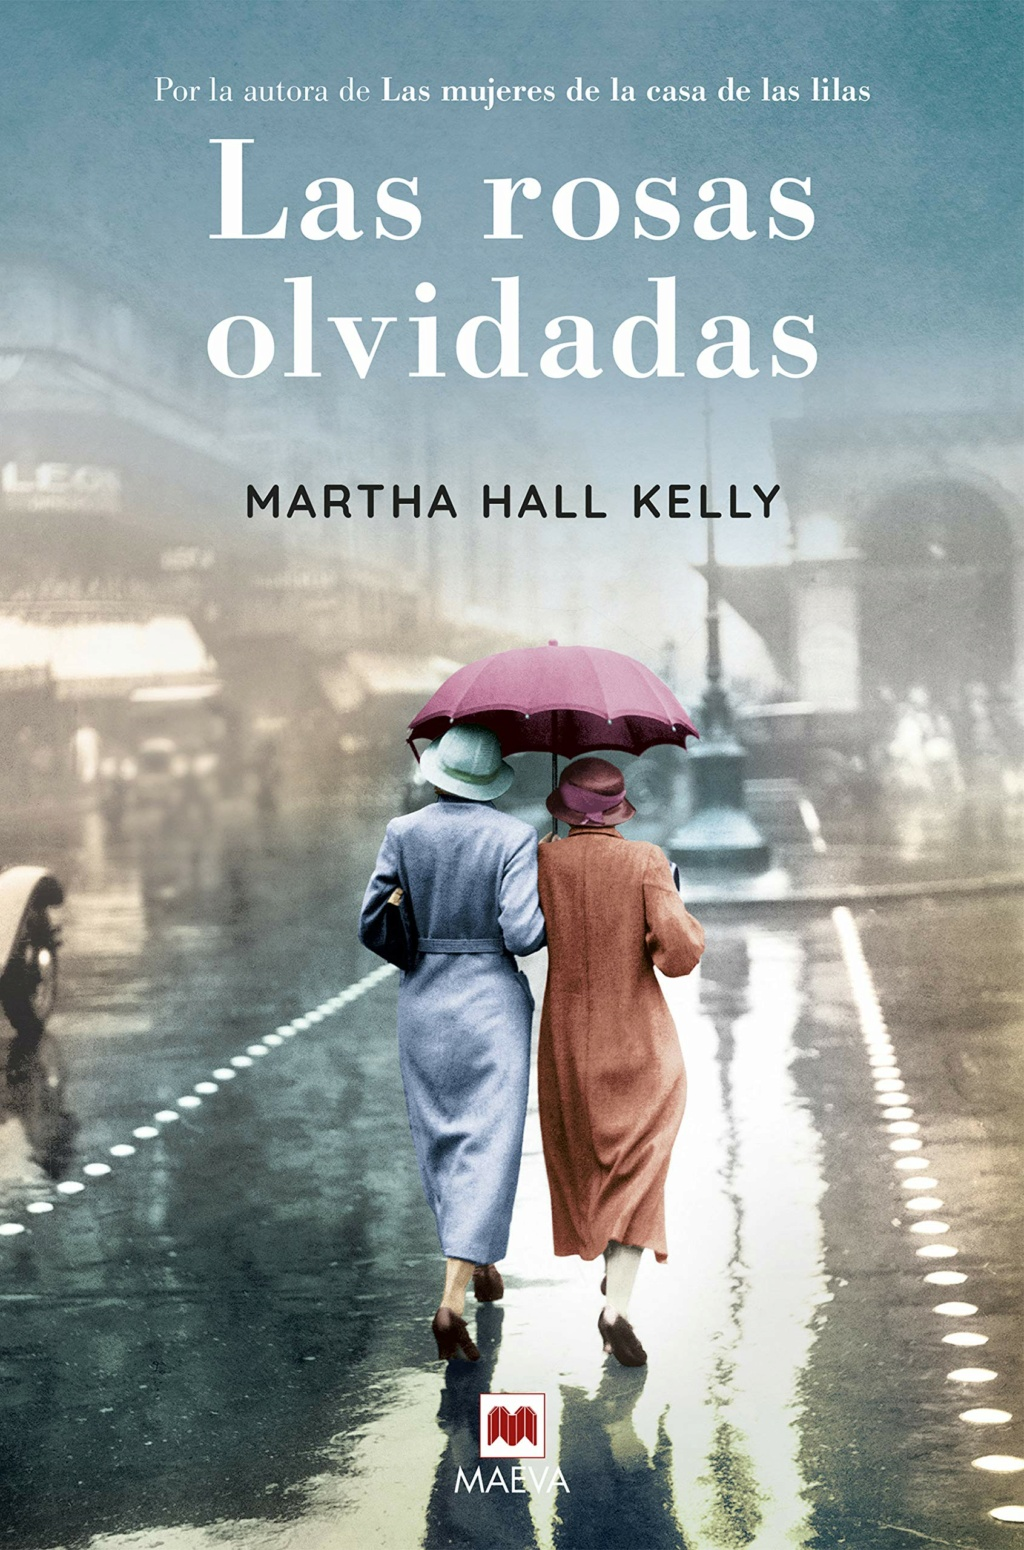 Las rosas olvidadas - Martha Hall Kelly Las-ro10